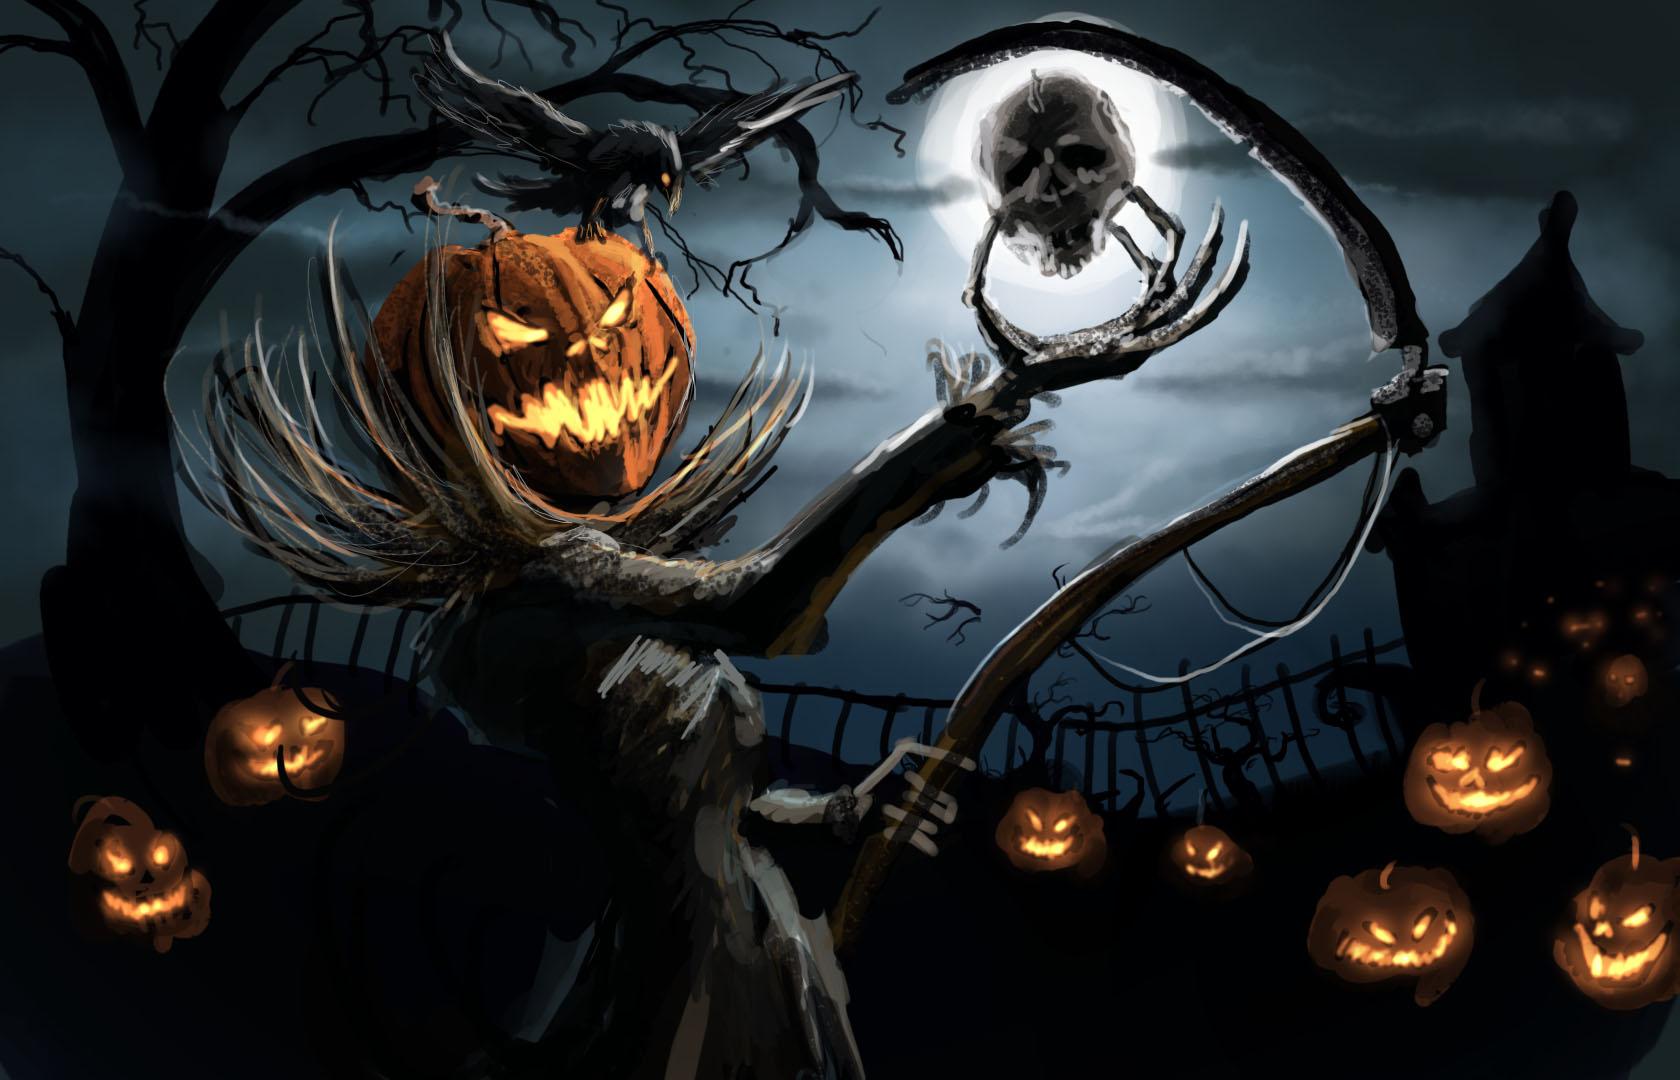 Beautiful Wallpaper Halloween Spooky - creepy_halloween_wallpaper_001  Pic_957618.jpg